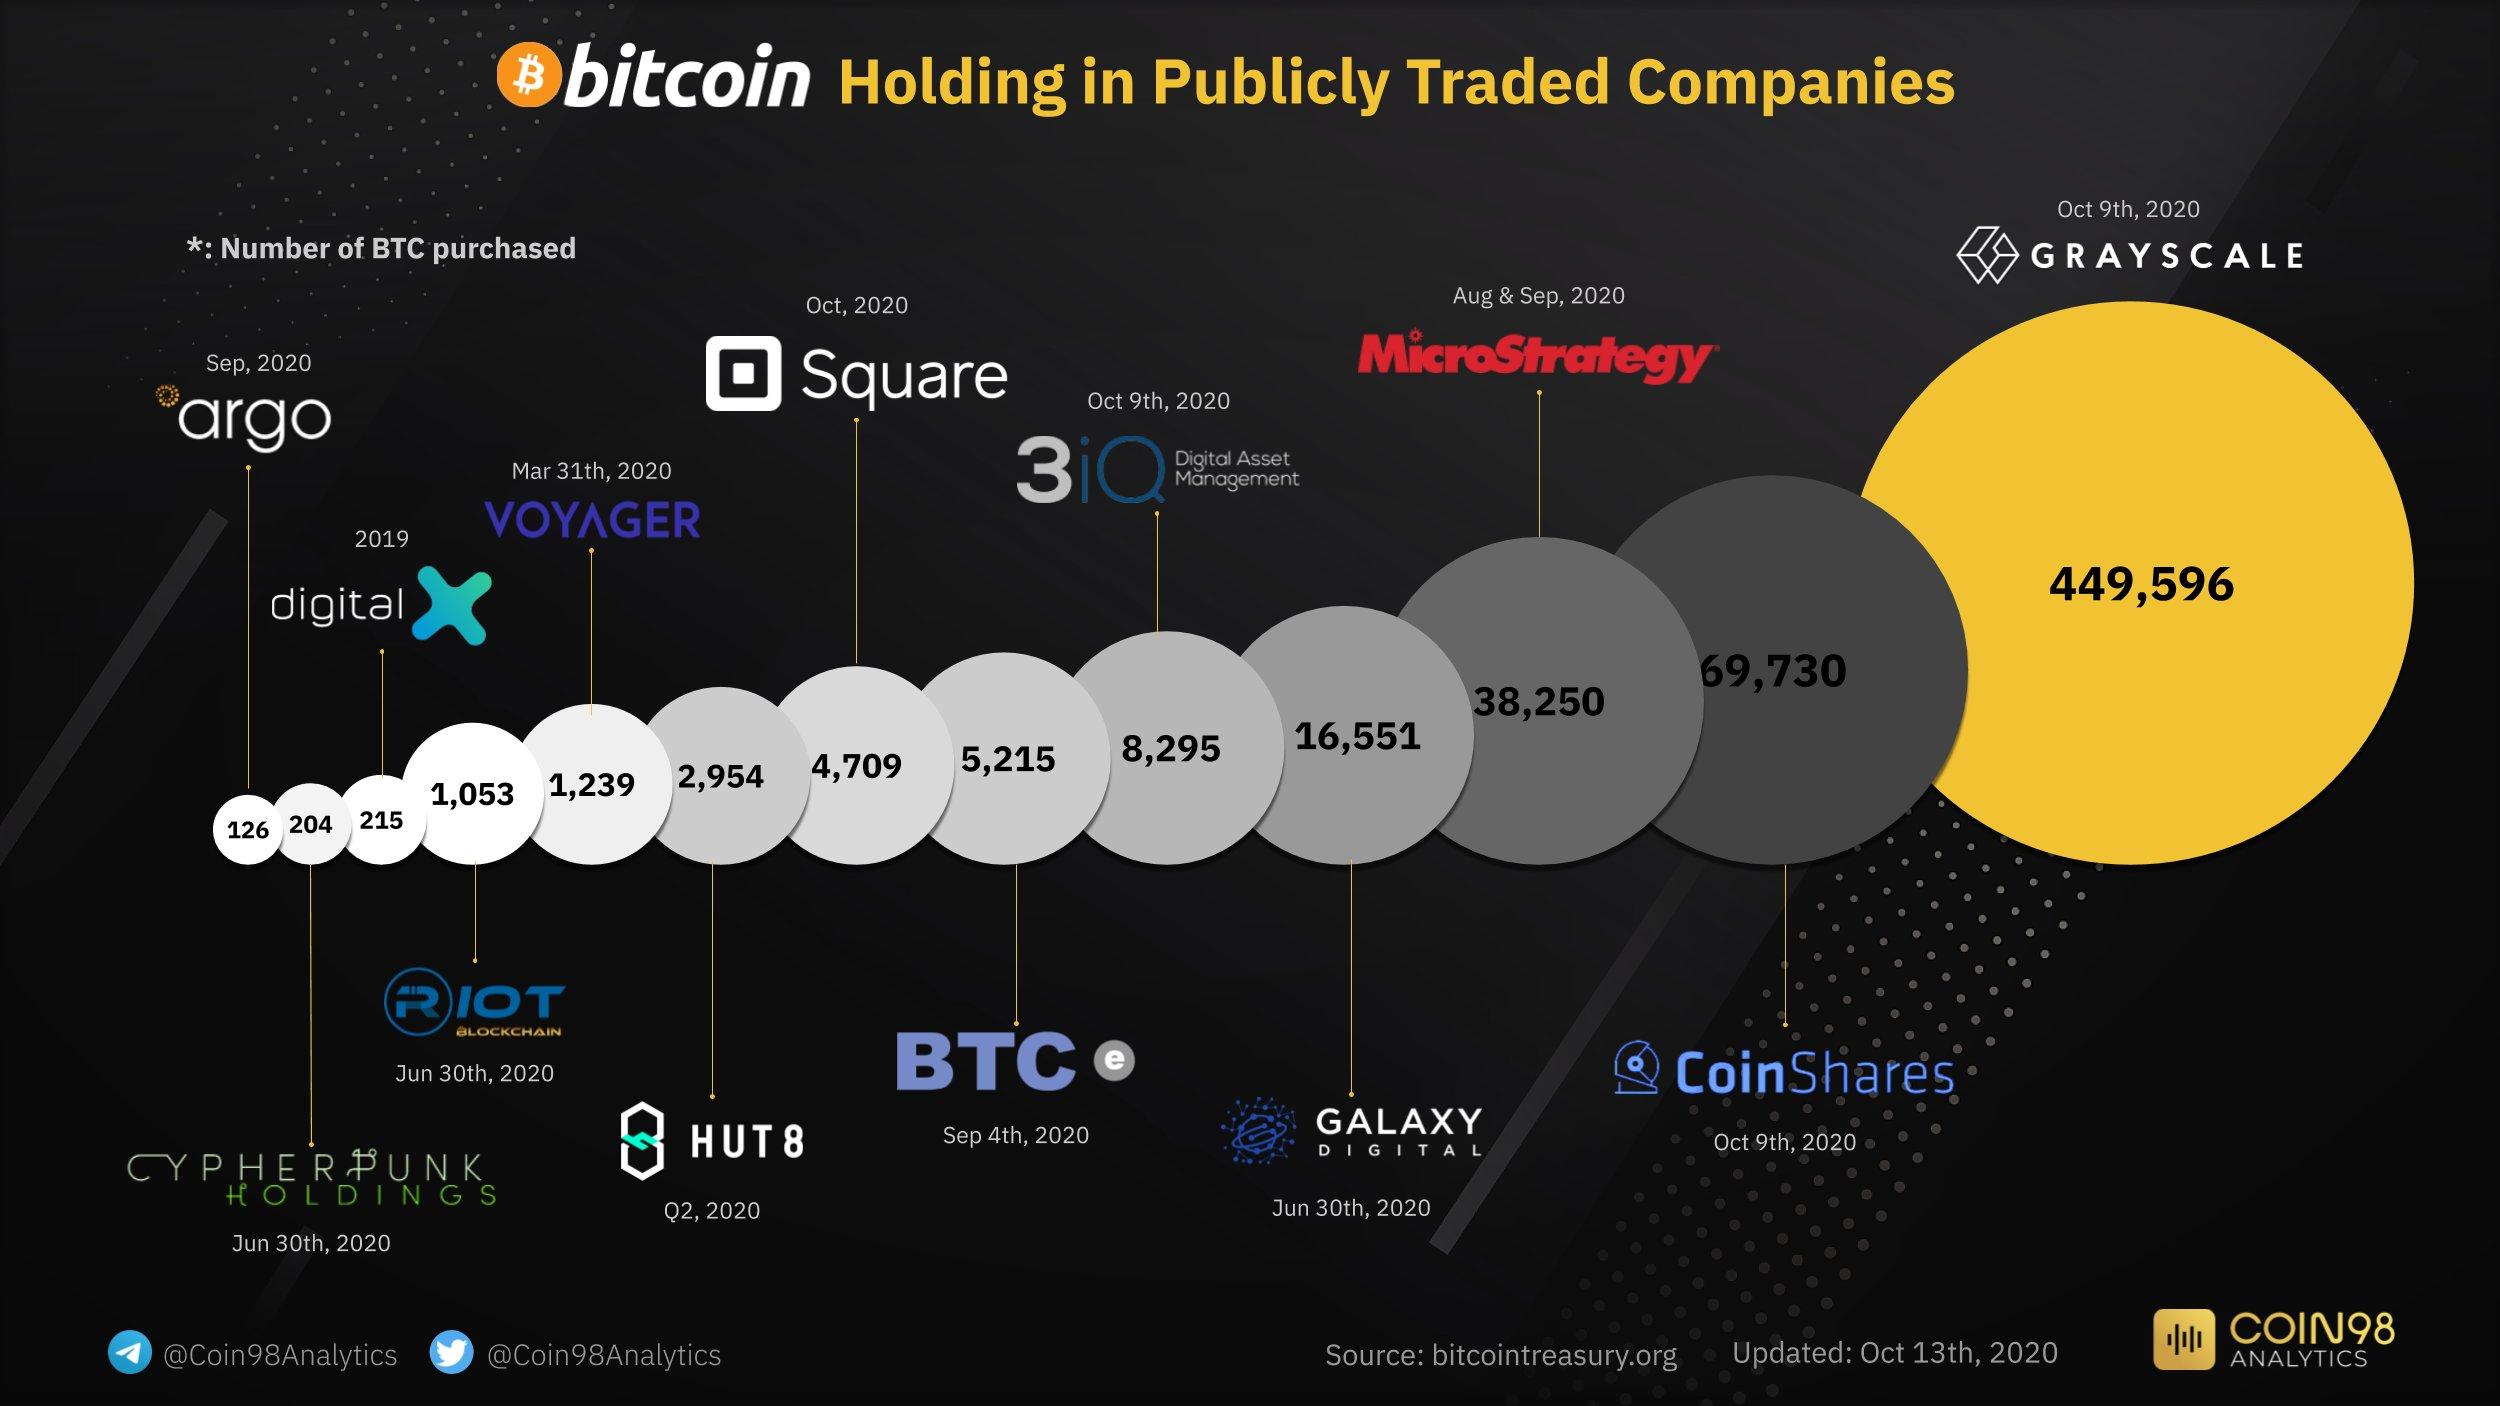 Corporate Bitcoin Holdings - Coin98 Analytics/Bitcoin Treasury Data